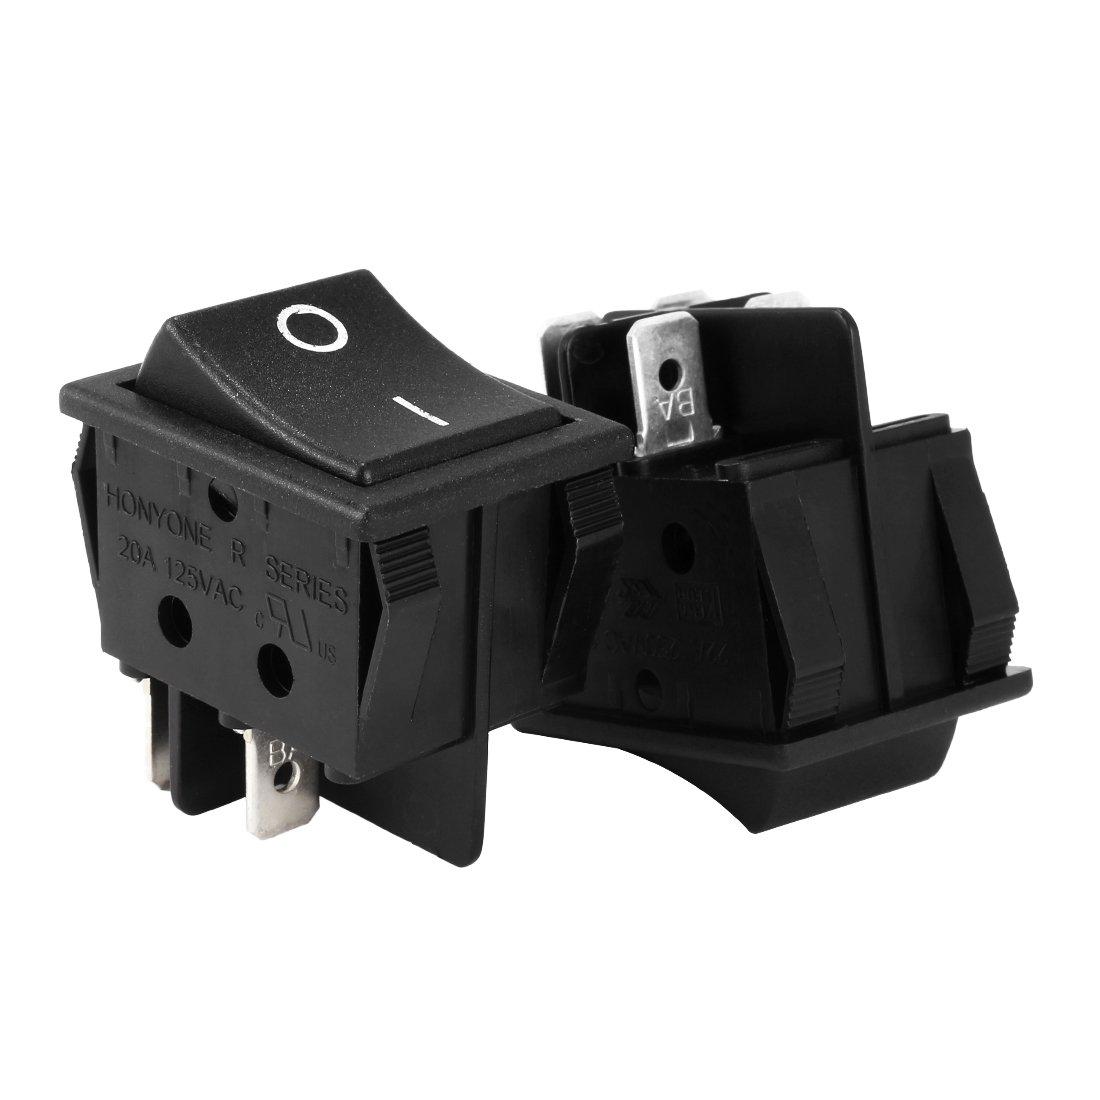 uxcell DPST 4Pin 2 Position I/O Boat Rocker Switch Black AC 20A/125V 22A/250V